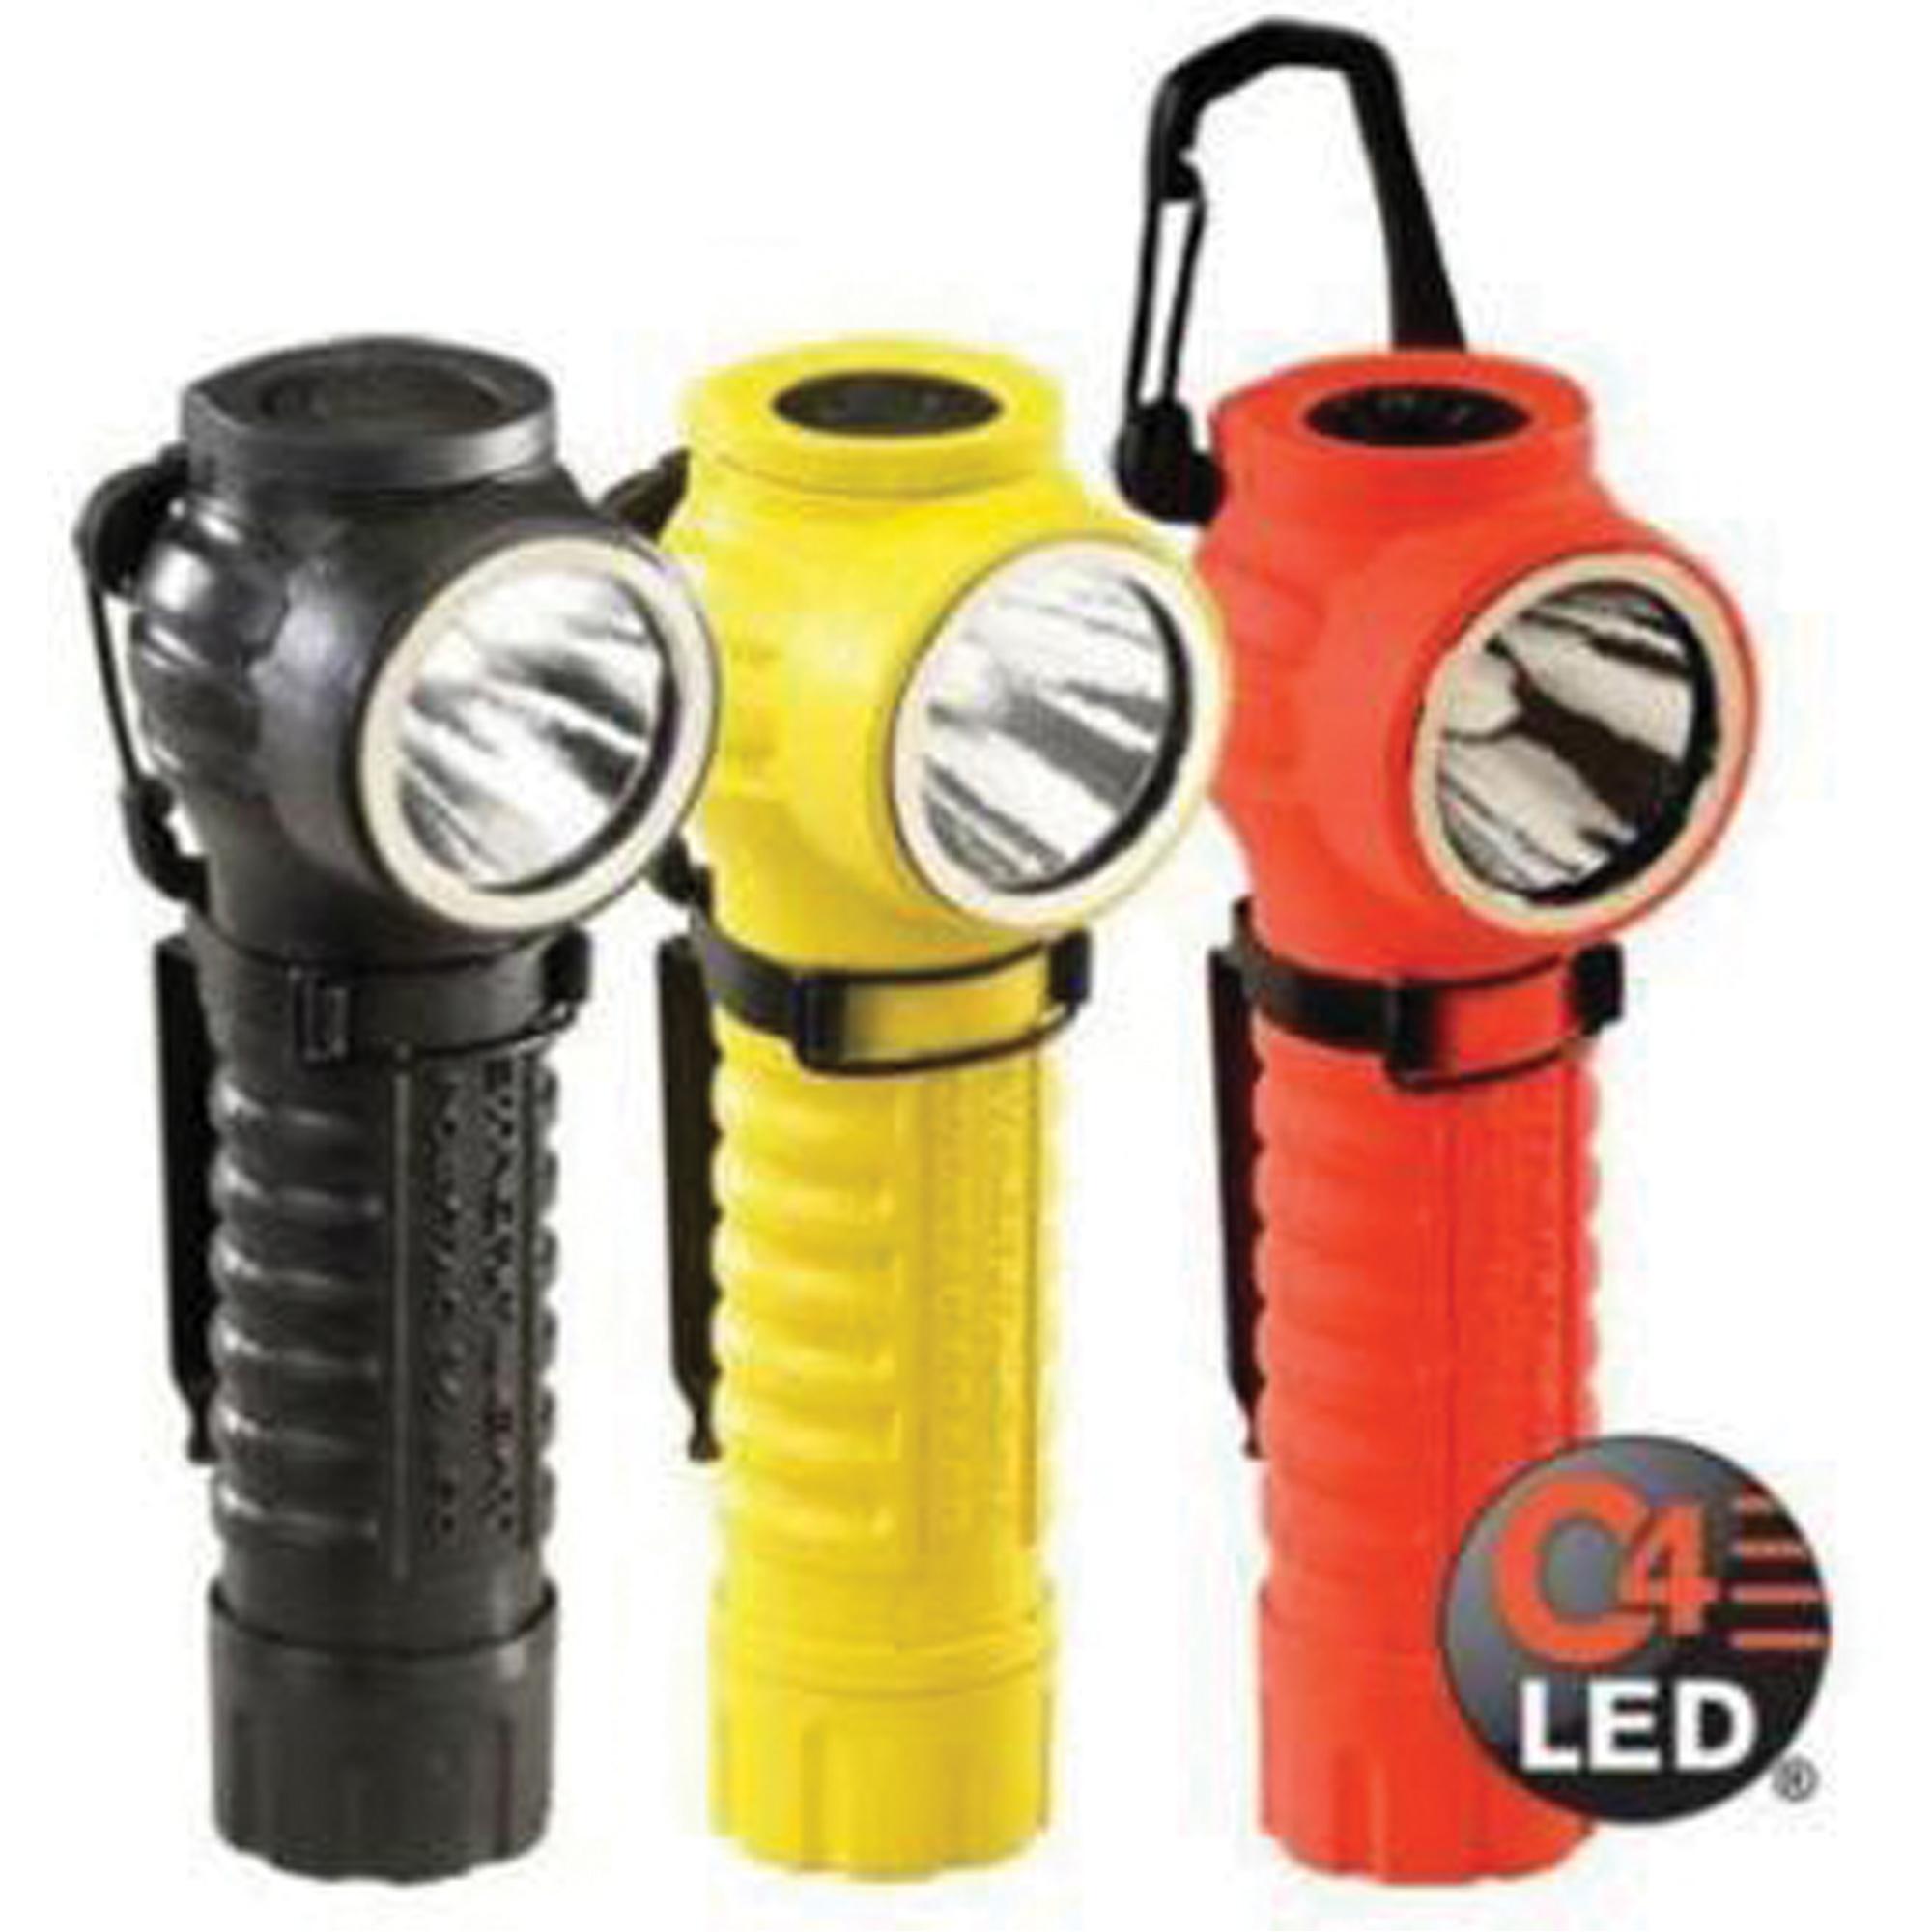 Streamilght PolyTAC 90 LED Right Angle Flashlight 88834